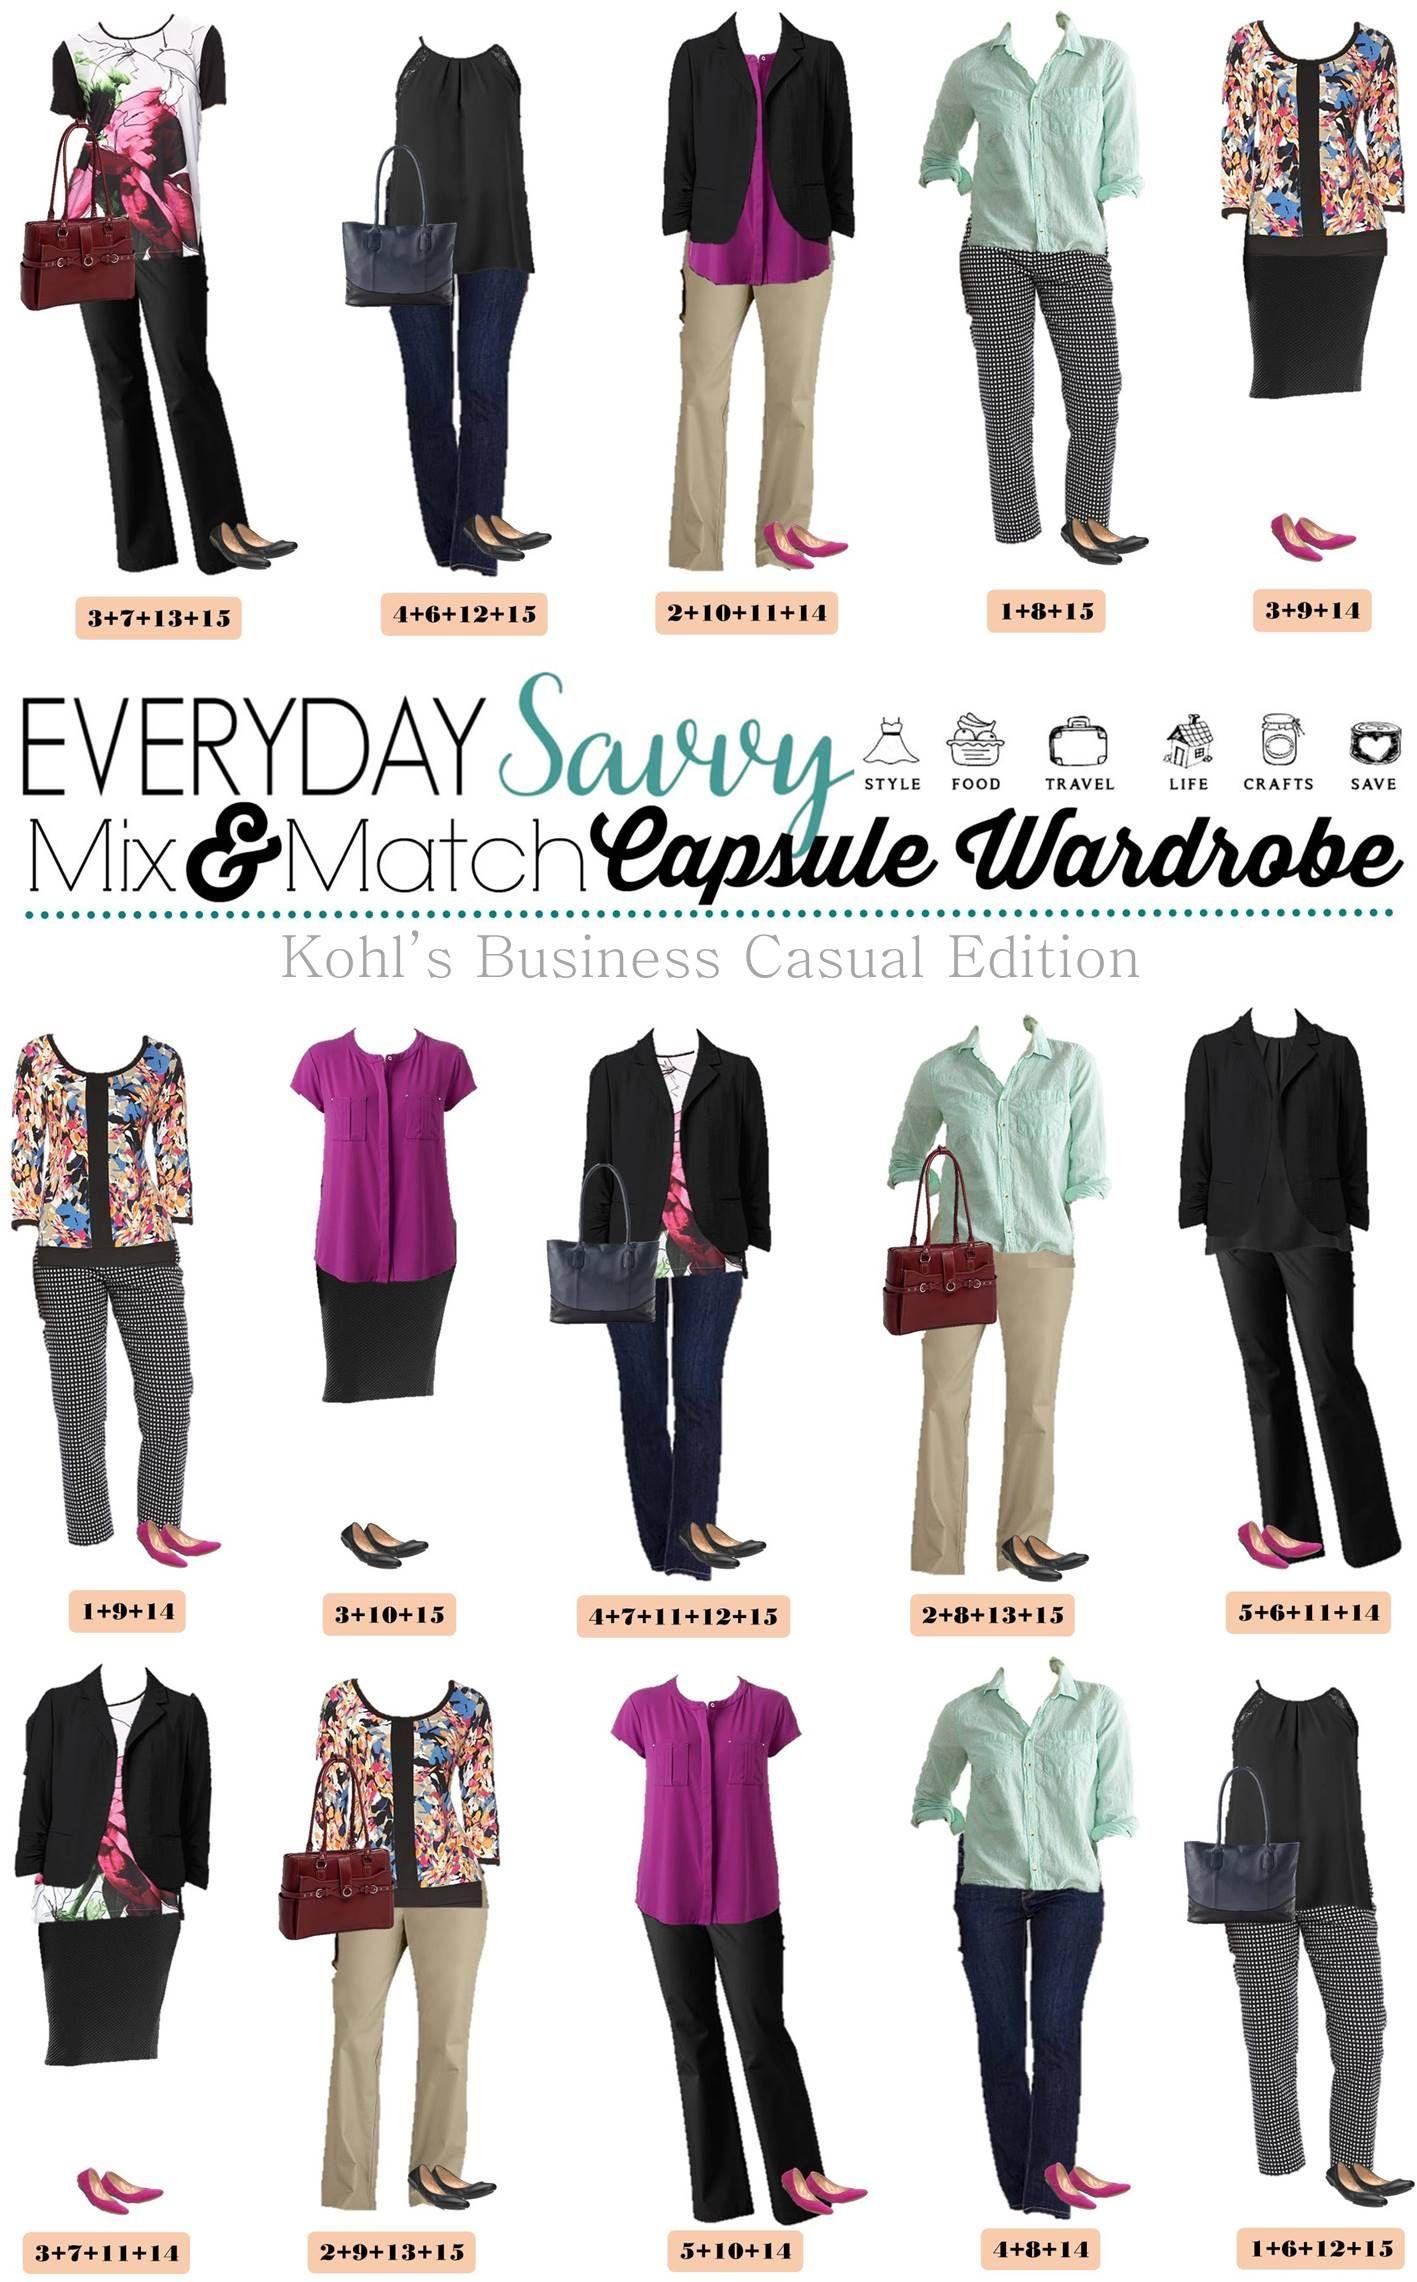 Kohls Business Casual Attire for Women - Capsule Wardrobe  Spring